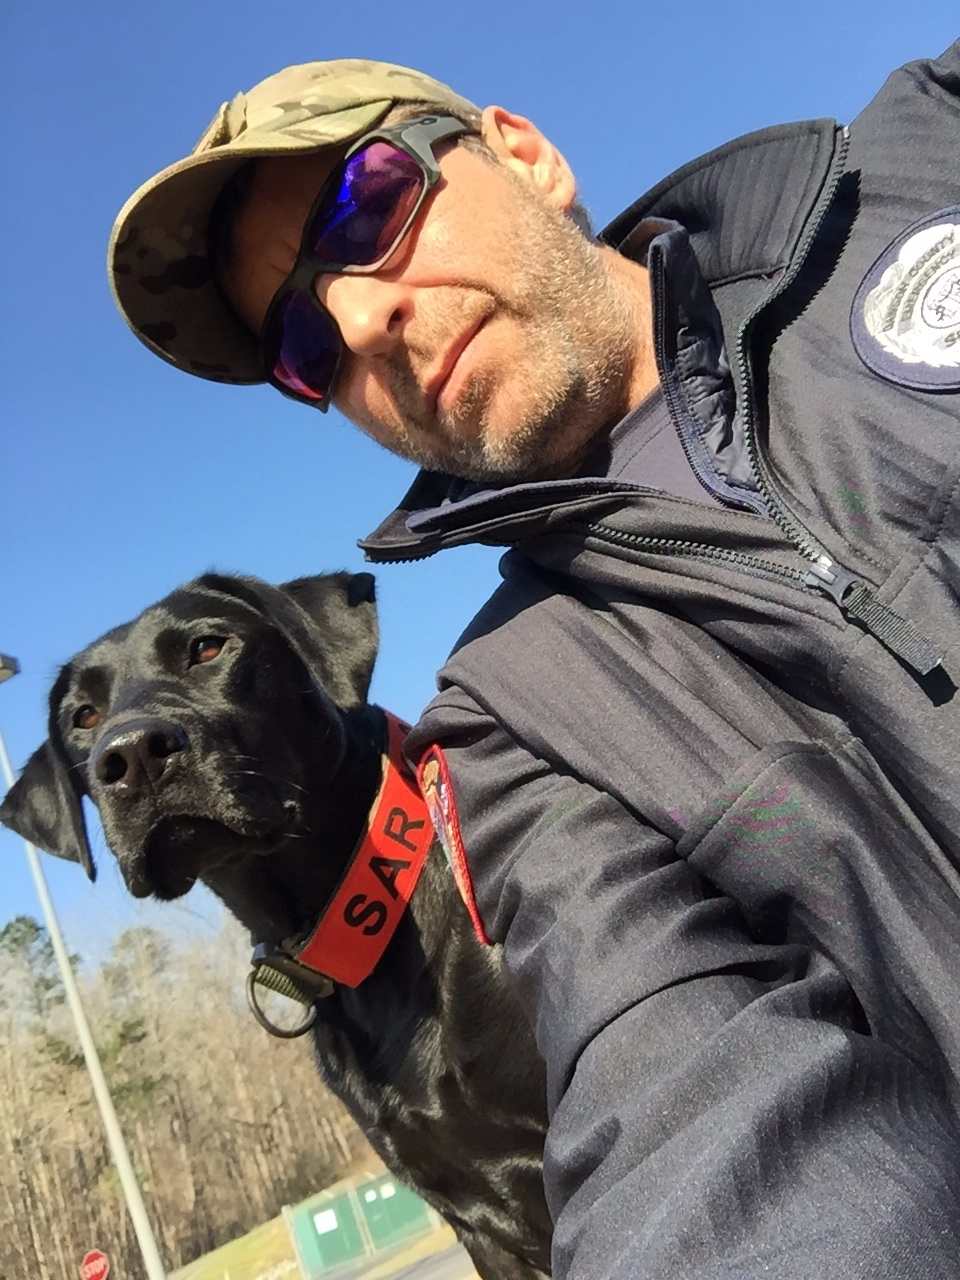 Carson Chinn - K9 Instructor, Rescue Specialist